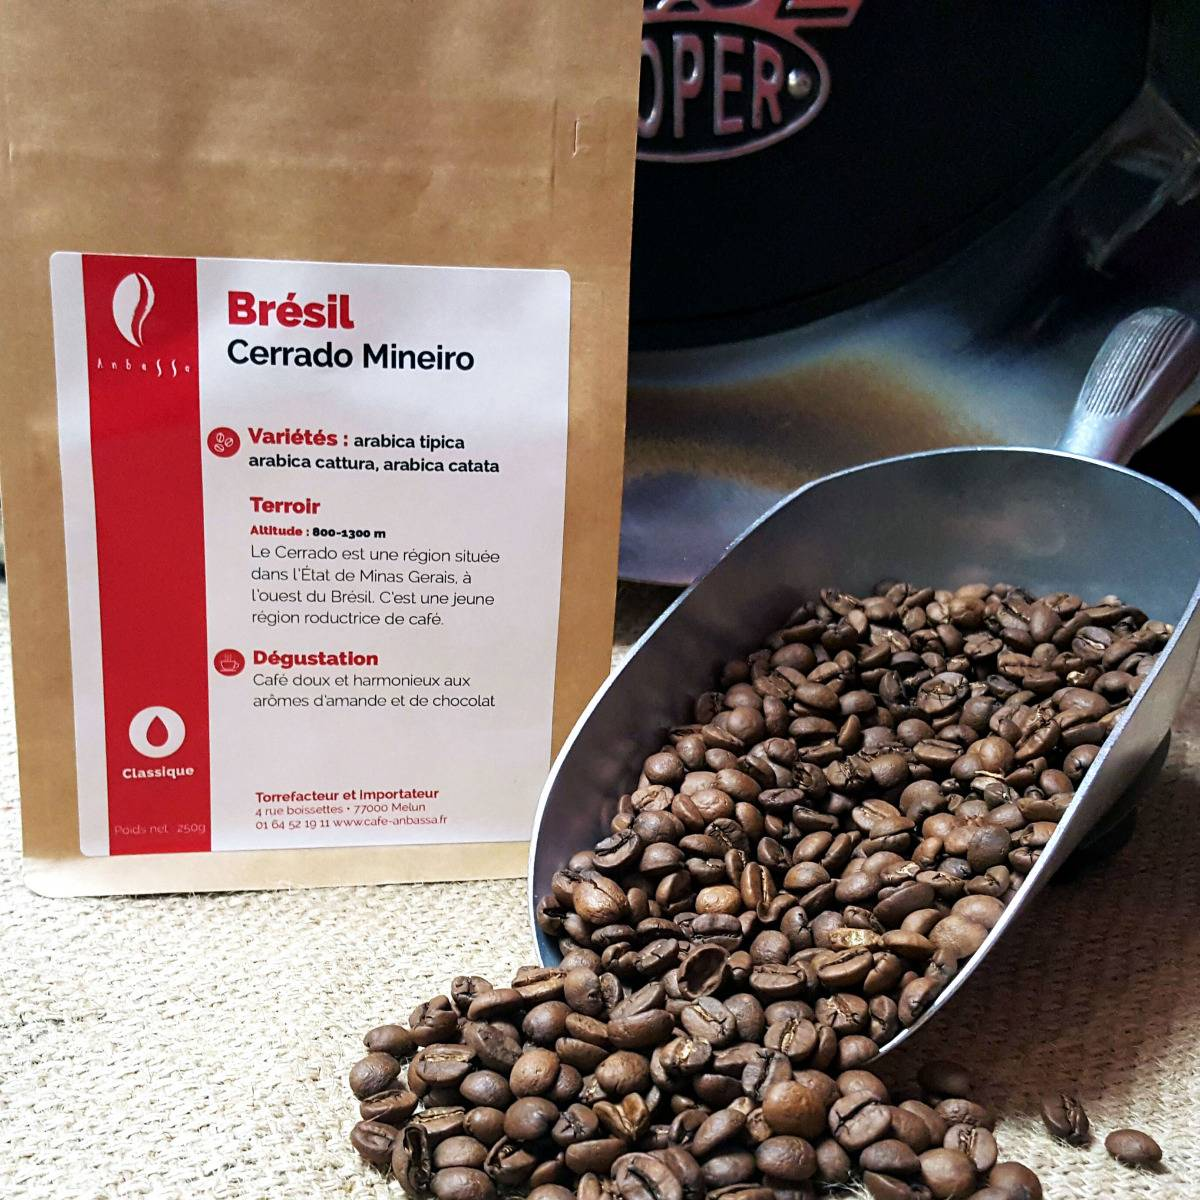 Brûlerie de Melun-Maison Anbassa Café Cerrado Mineiro-brésil - En Grains